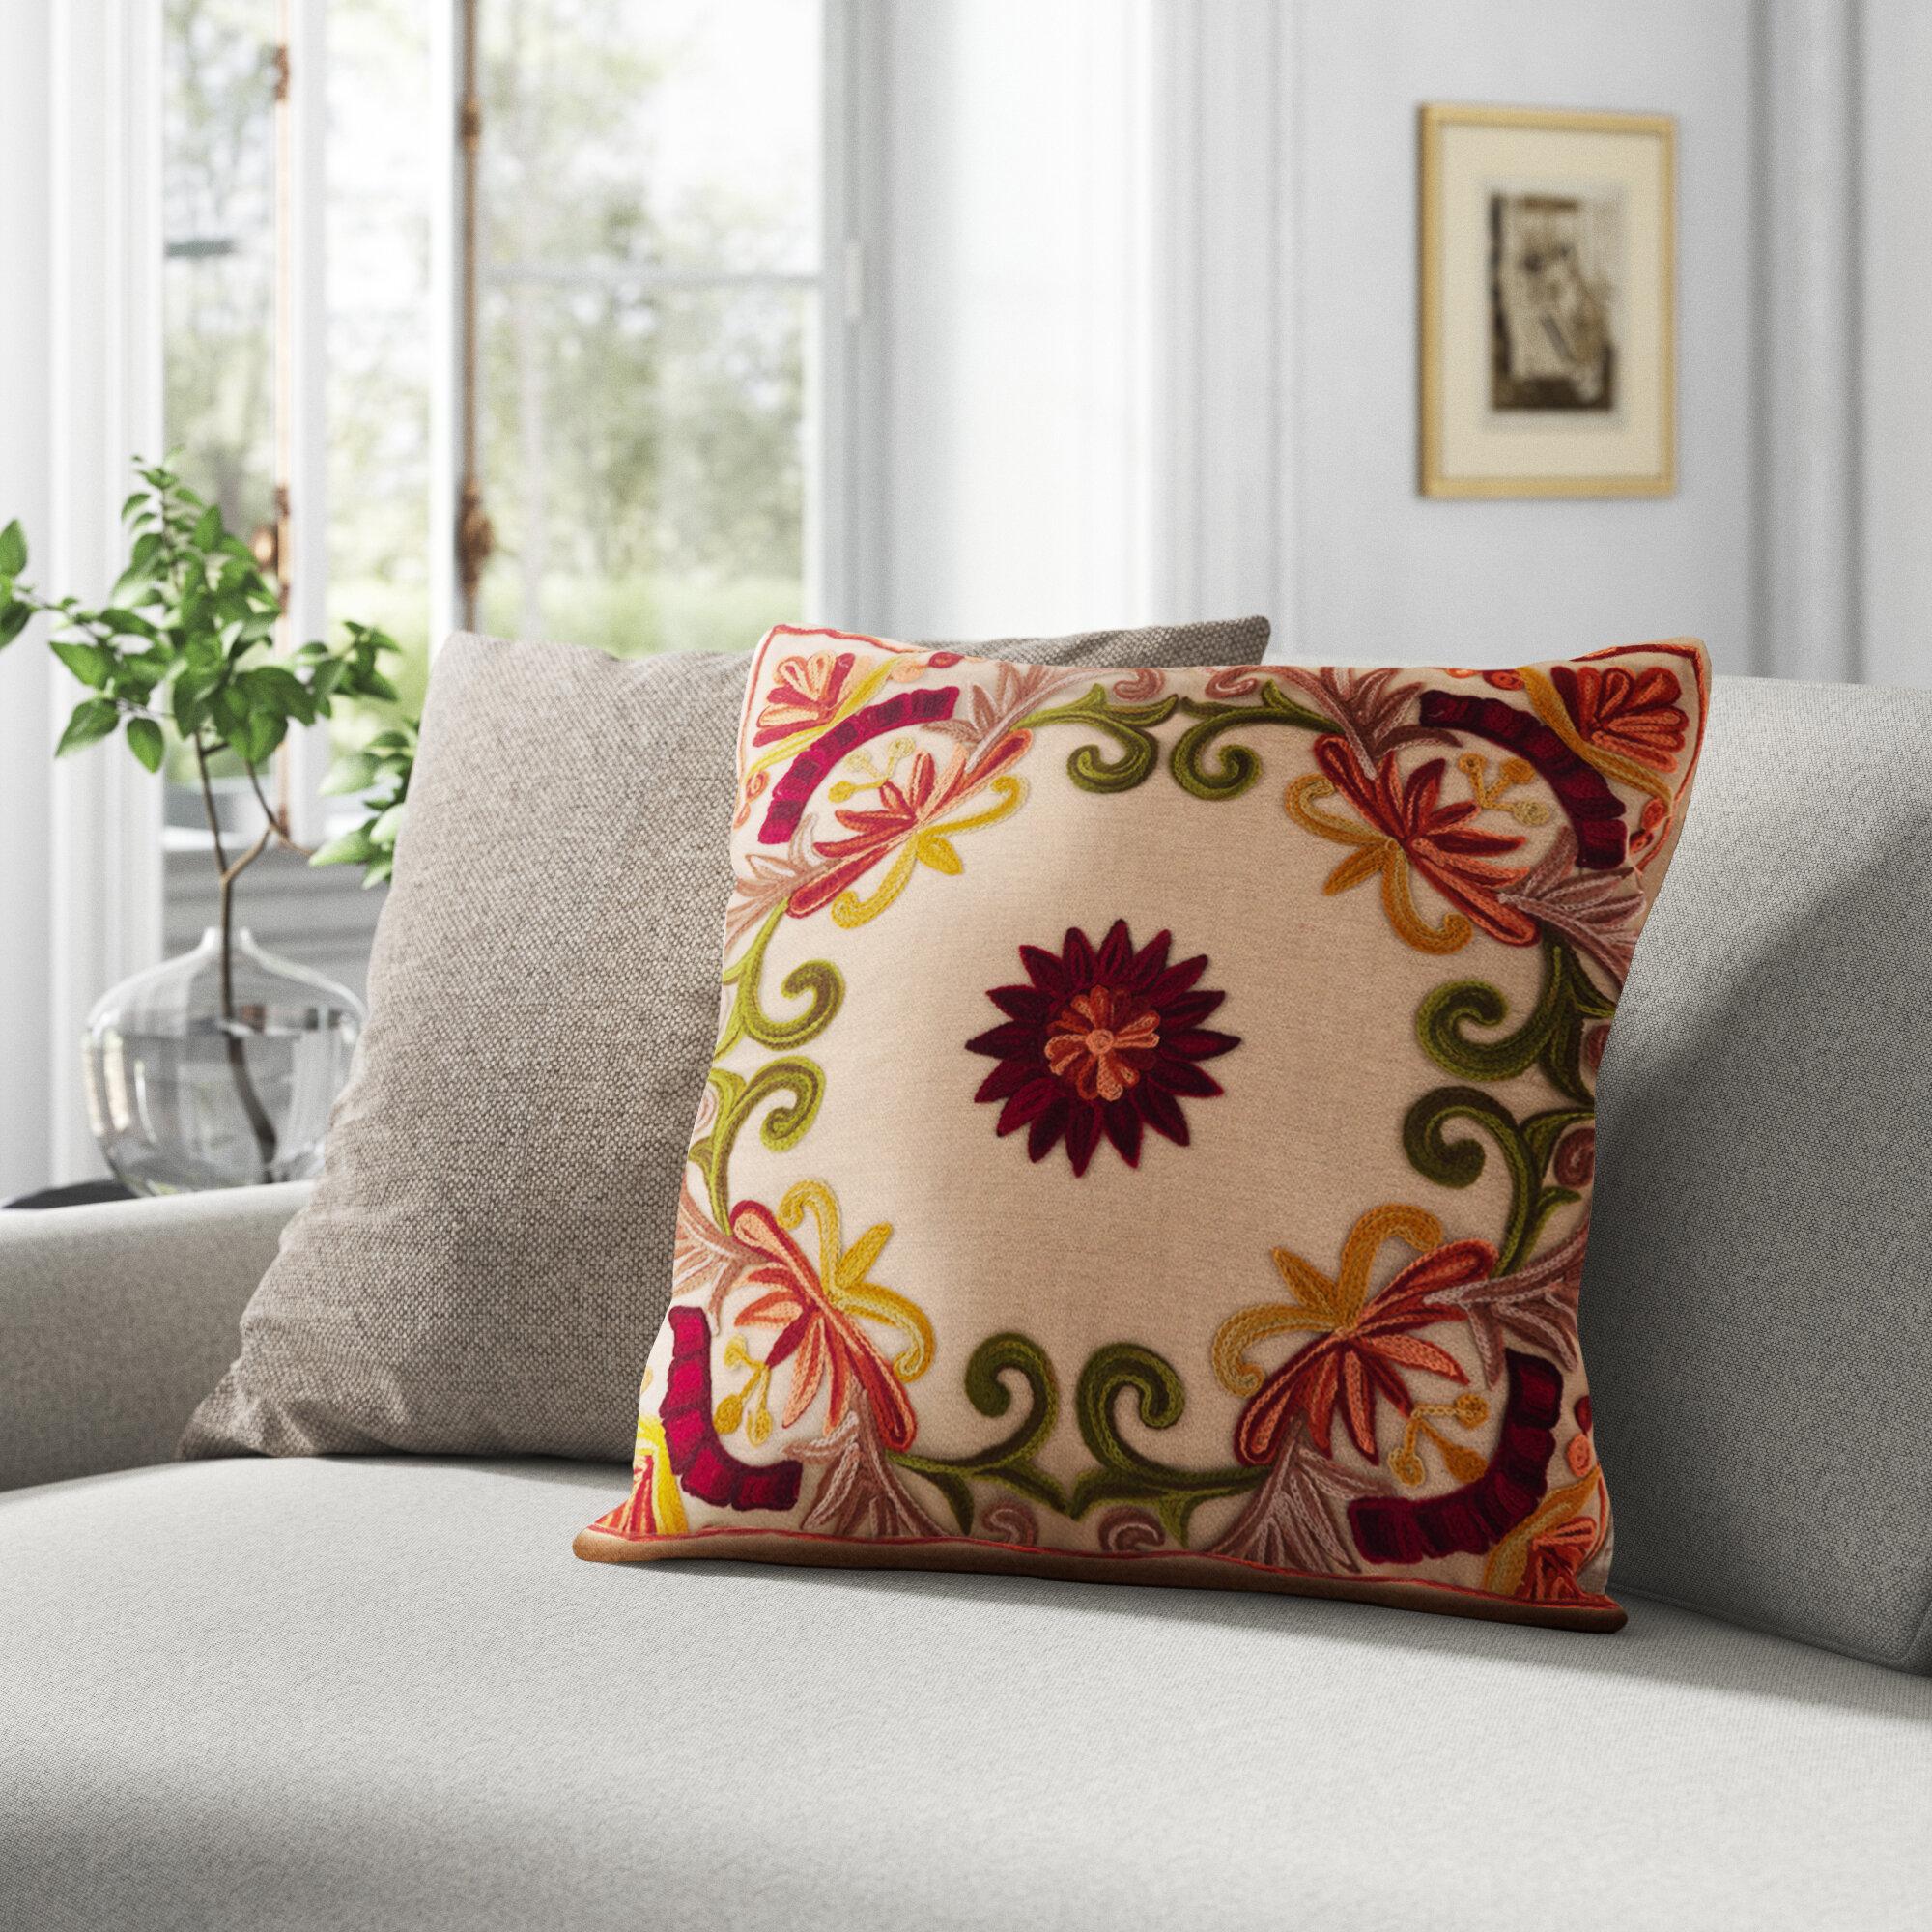 Kelly Clarkson Home Wells Cotton Floral Throw Pillow Reviews Wayfair